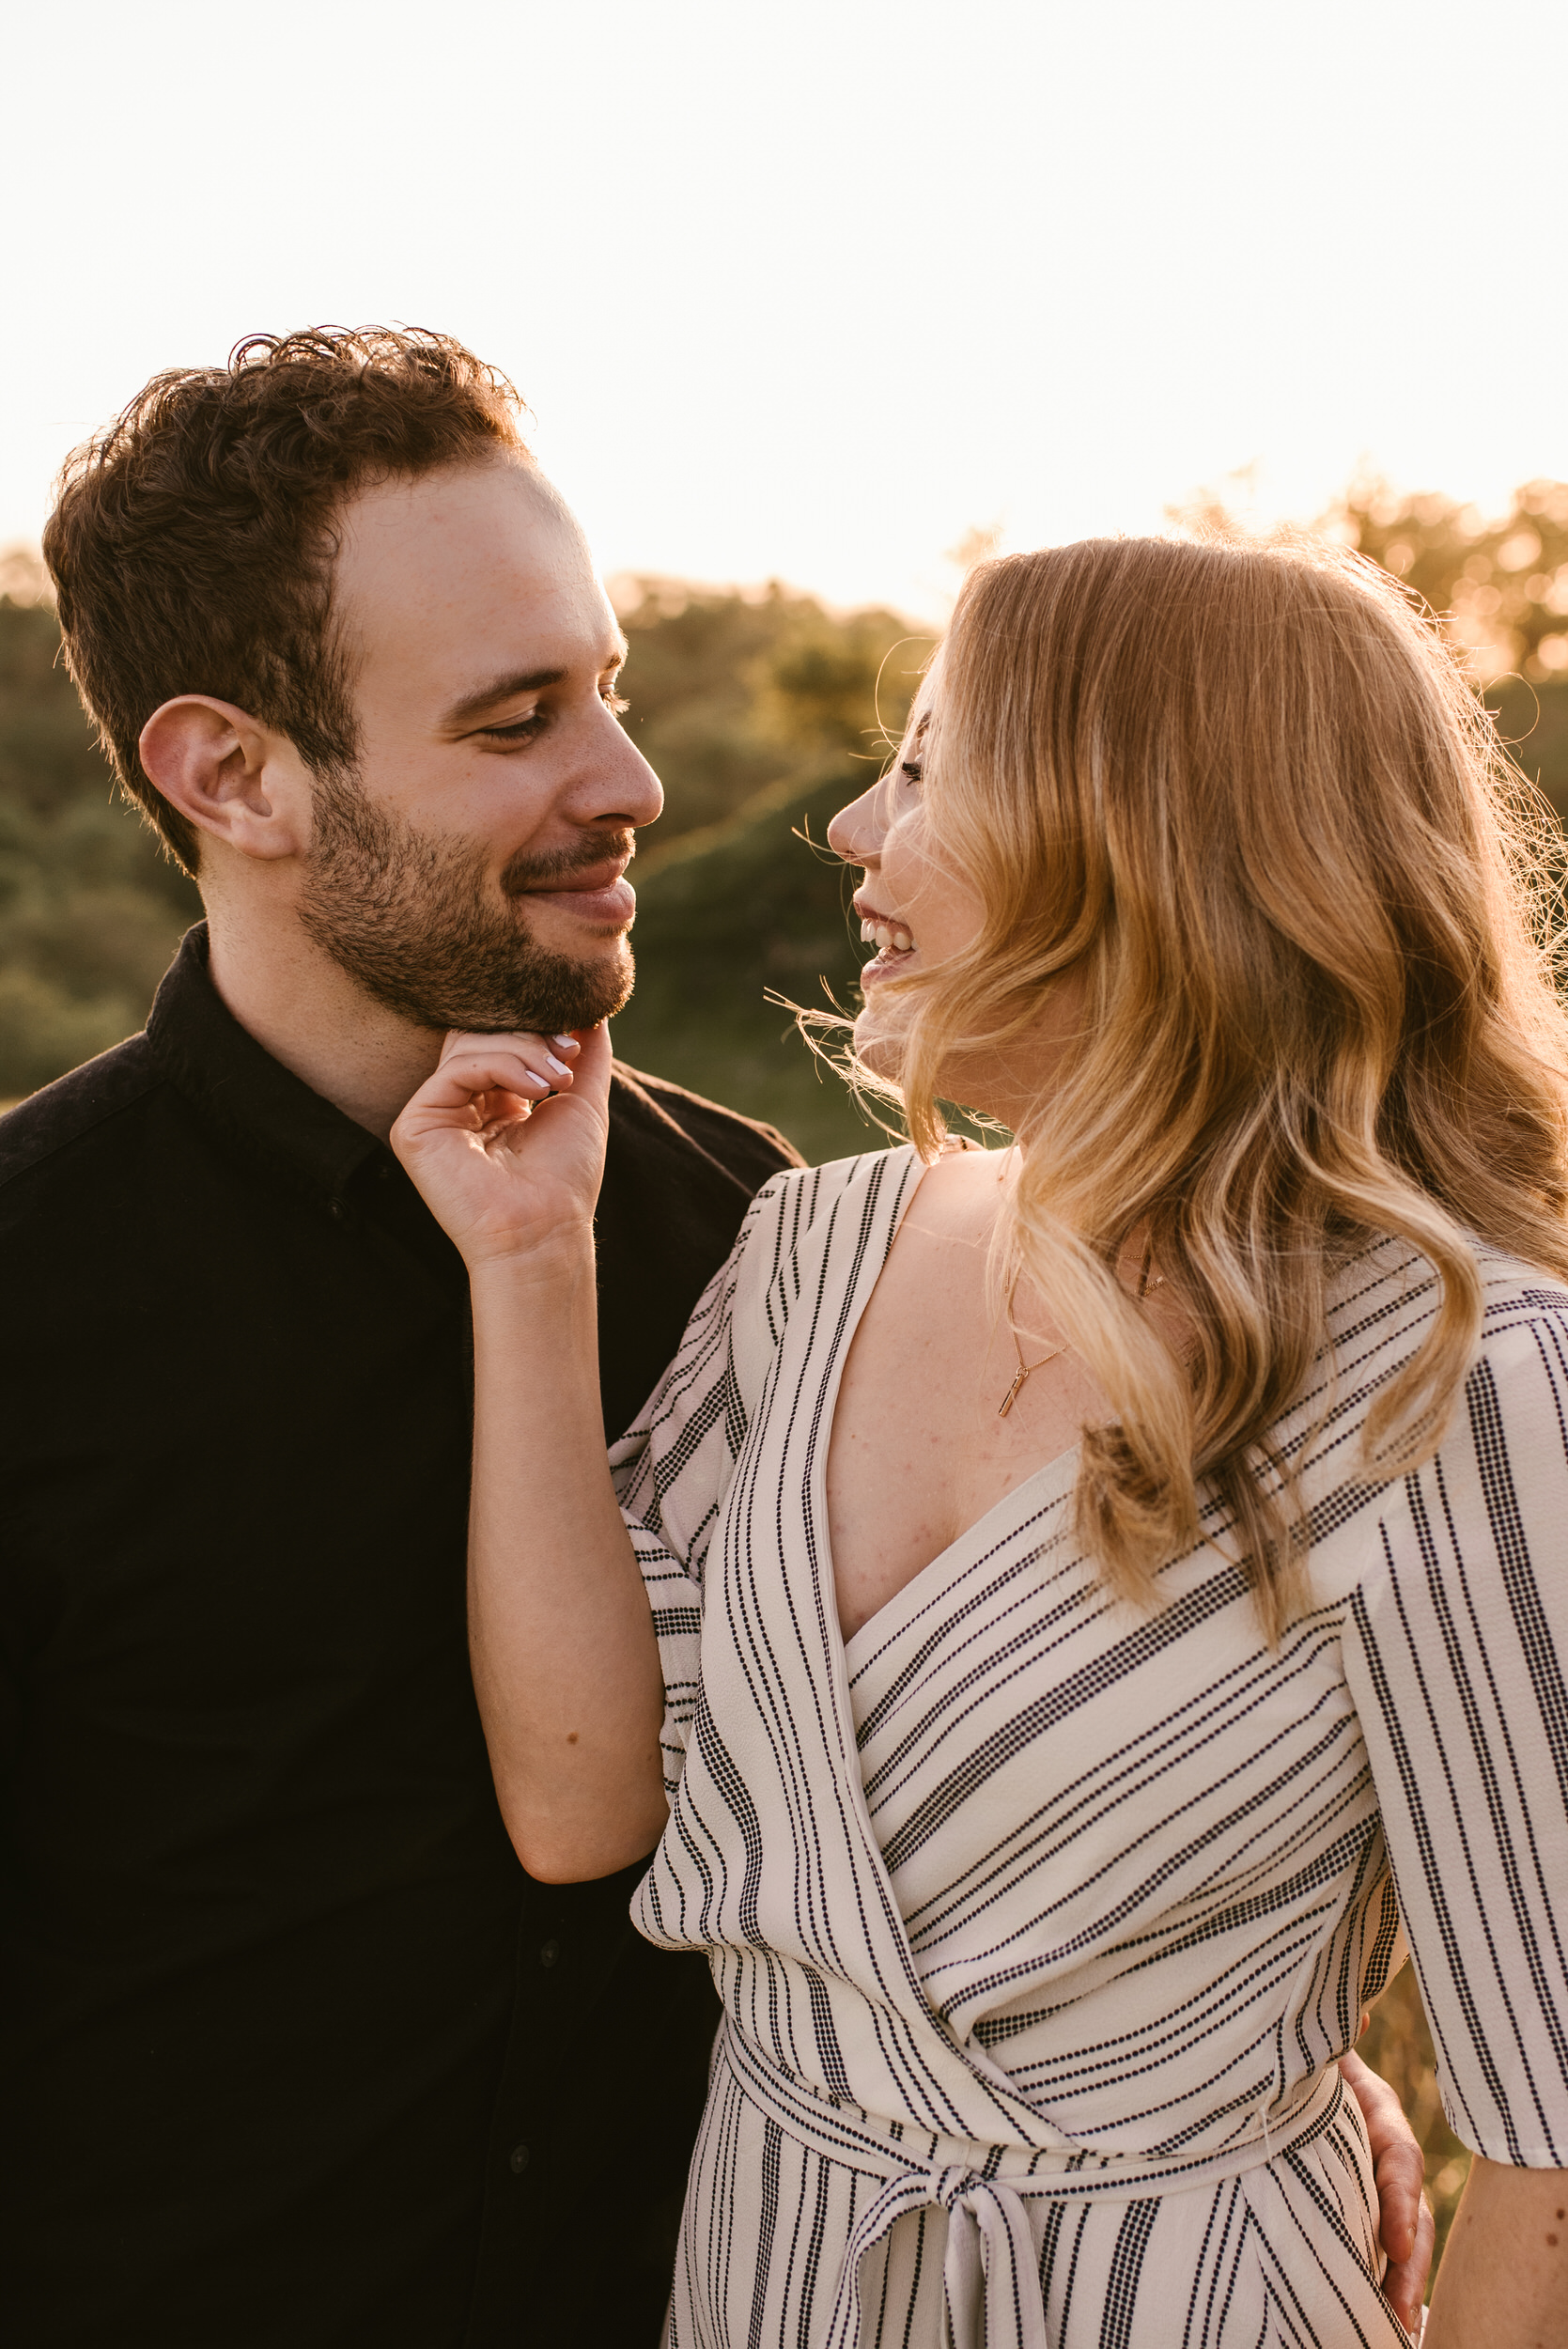 Omaha-Nebraska-Engagement-Session-Kaylie-Sirek-Photography-127.jpg